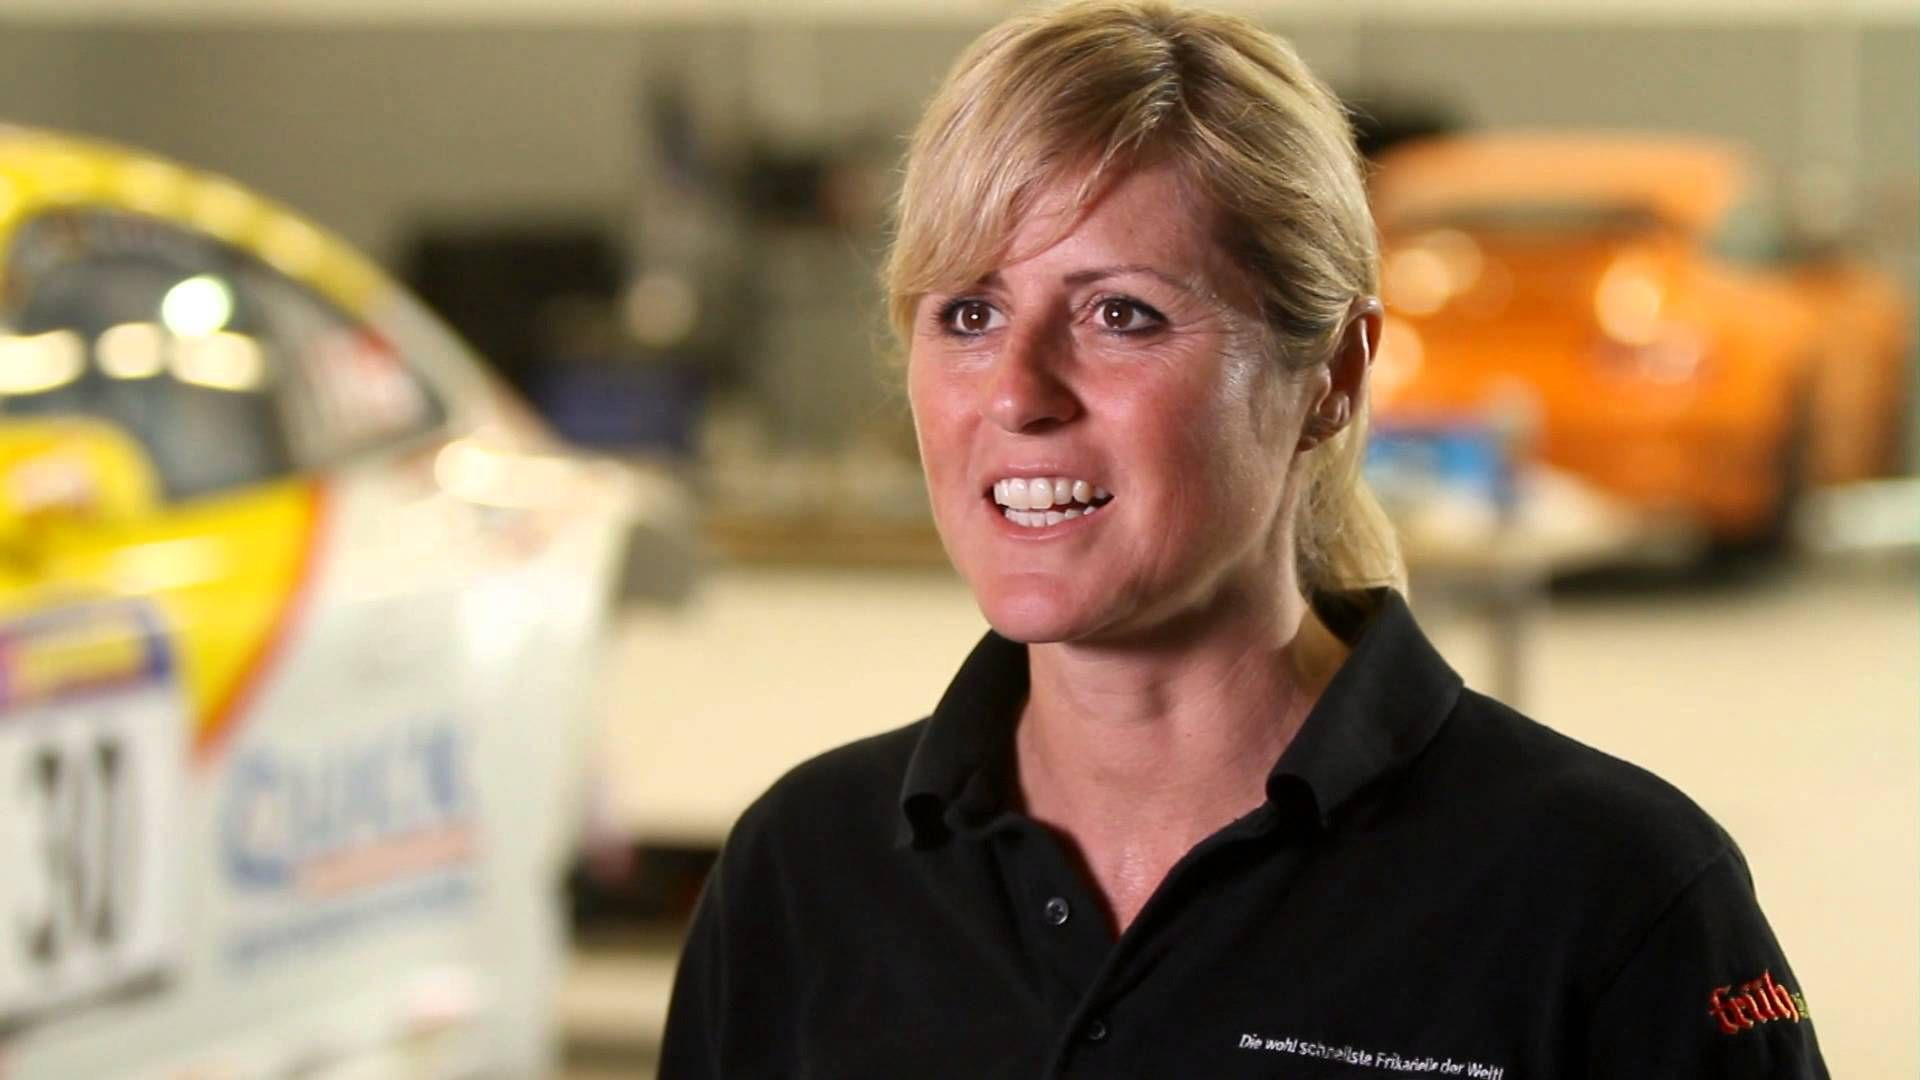 Sabine Schmitz isn't worried about Top Gear relaunch | MotoringBox